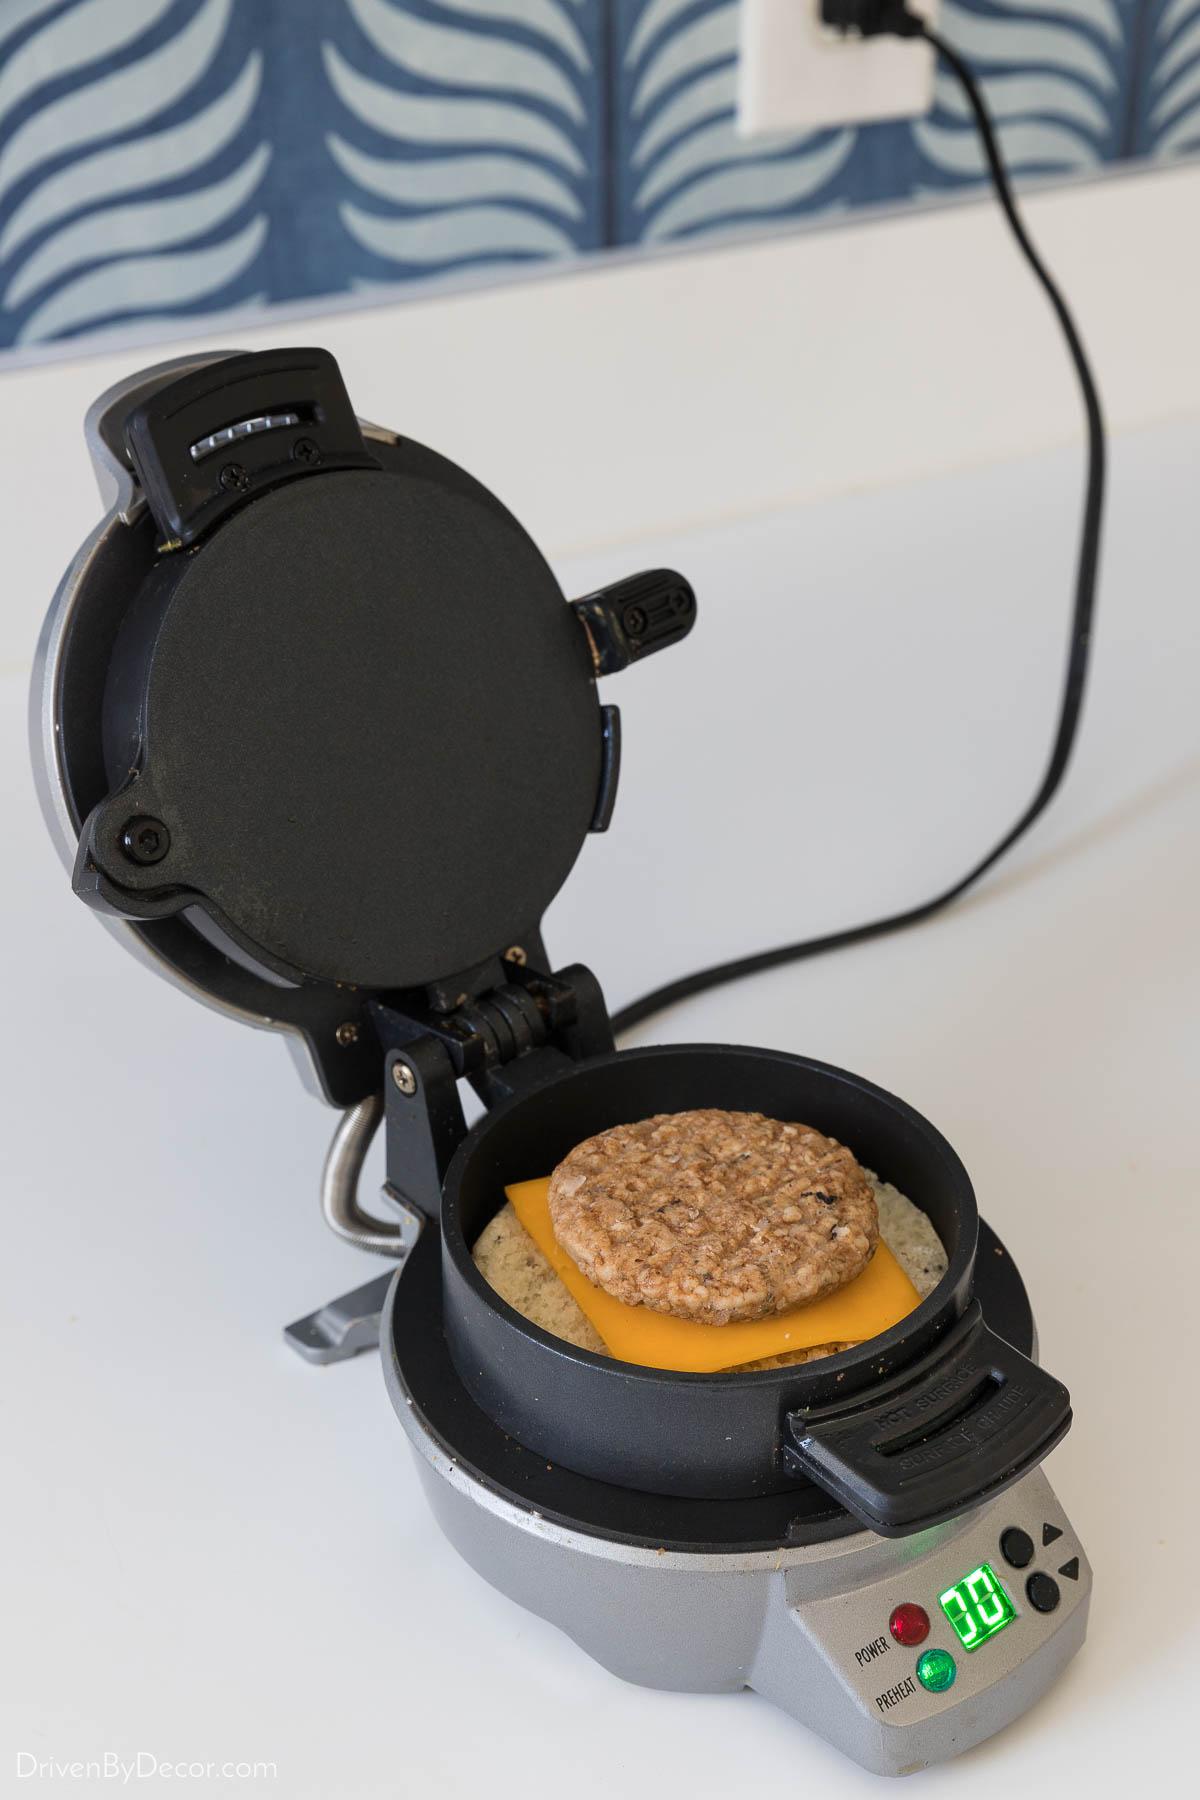 Love this breakfast sandwich maker!